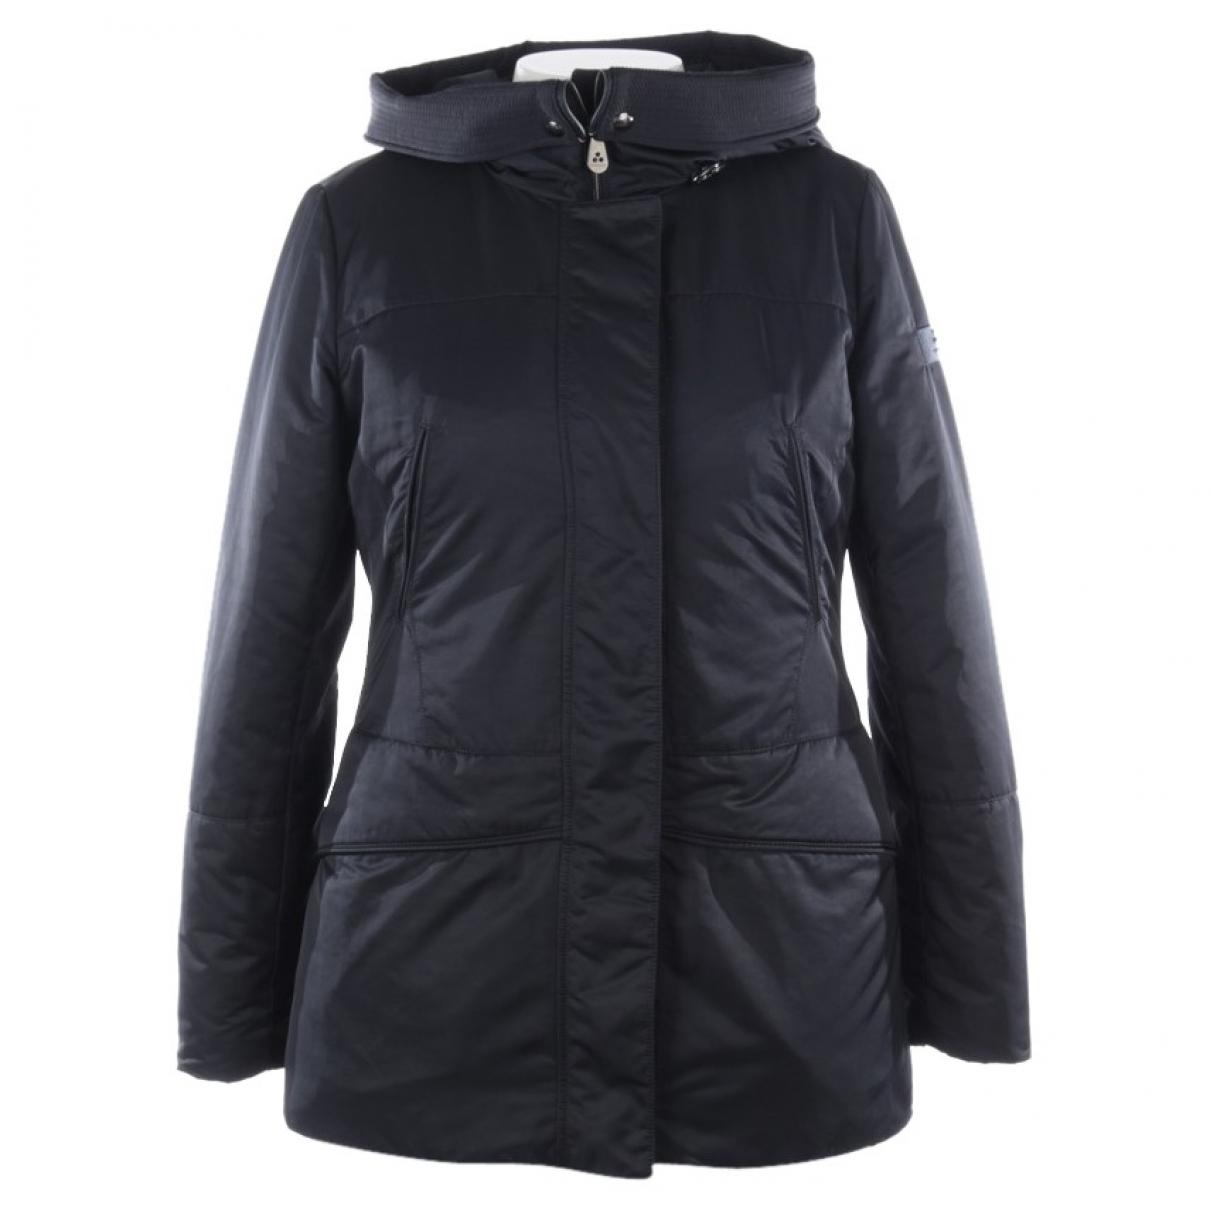 Peuterey \N Black jacket for Women 42 FR